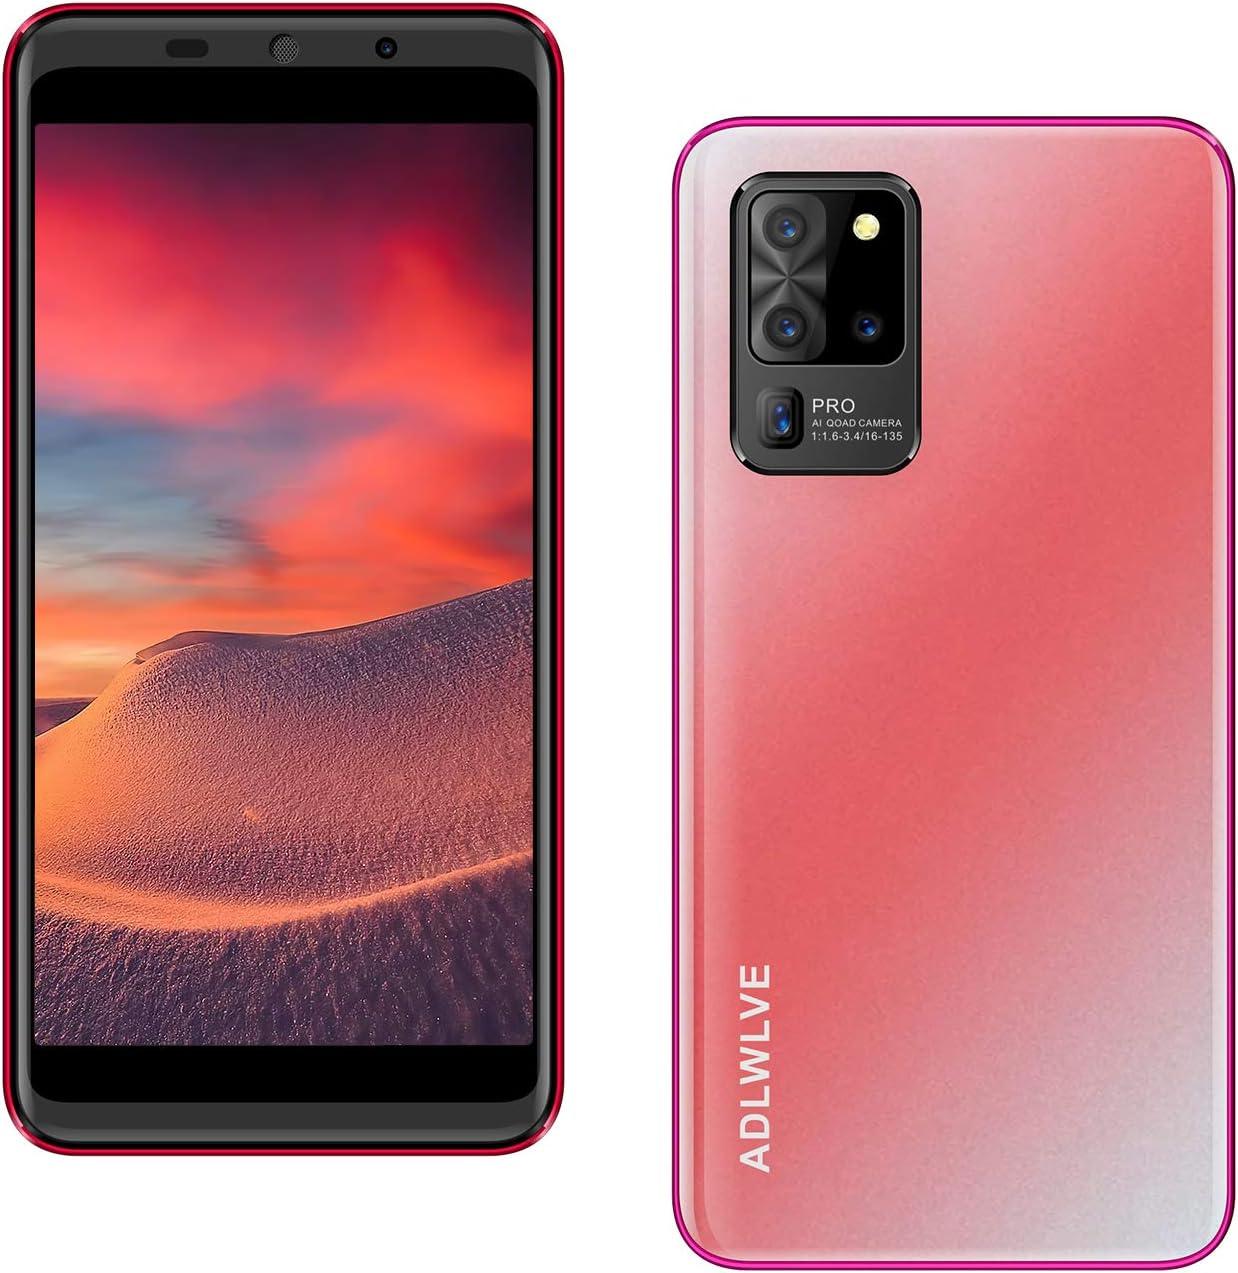 Teléfono Móvil Libres 4G, Android 9.1 Smartphone Libre, 5.5